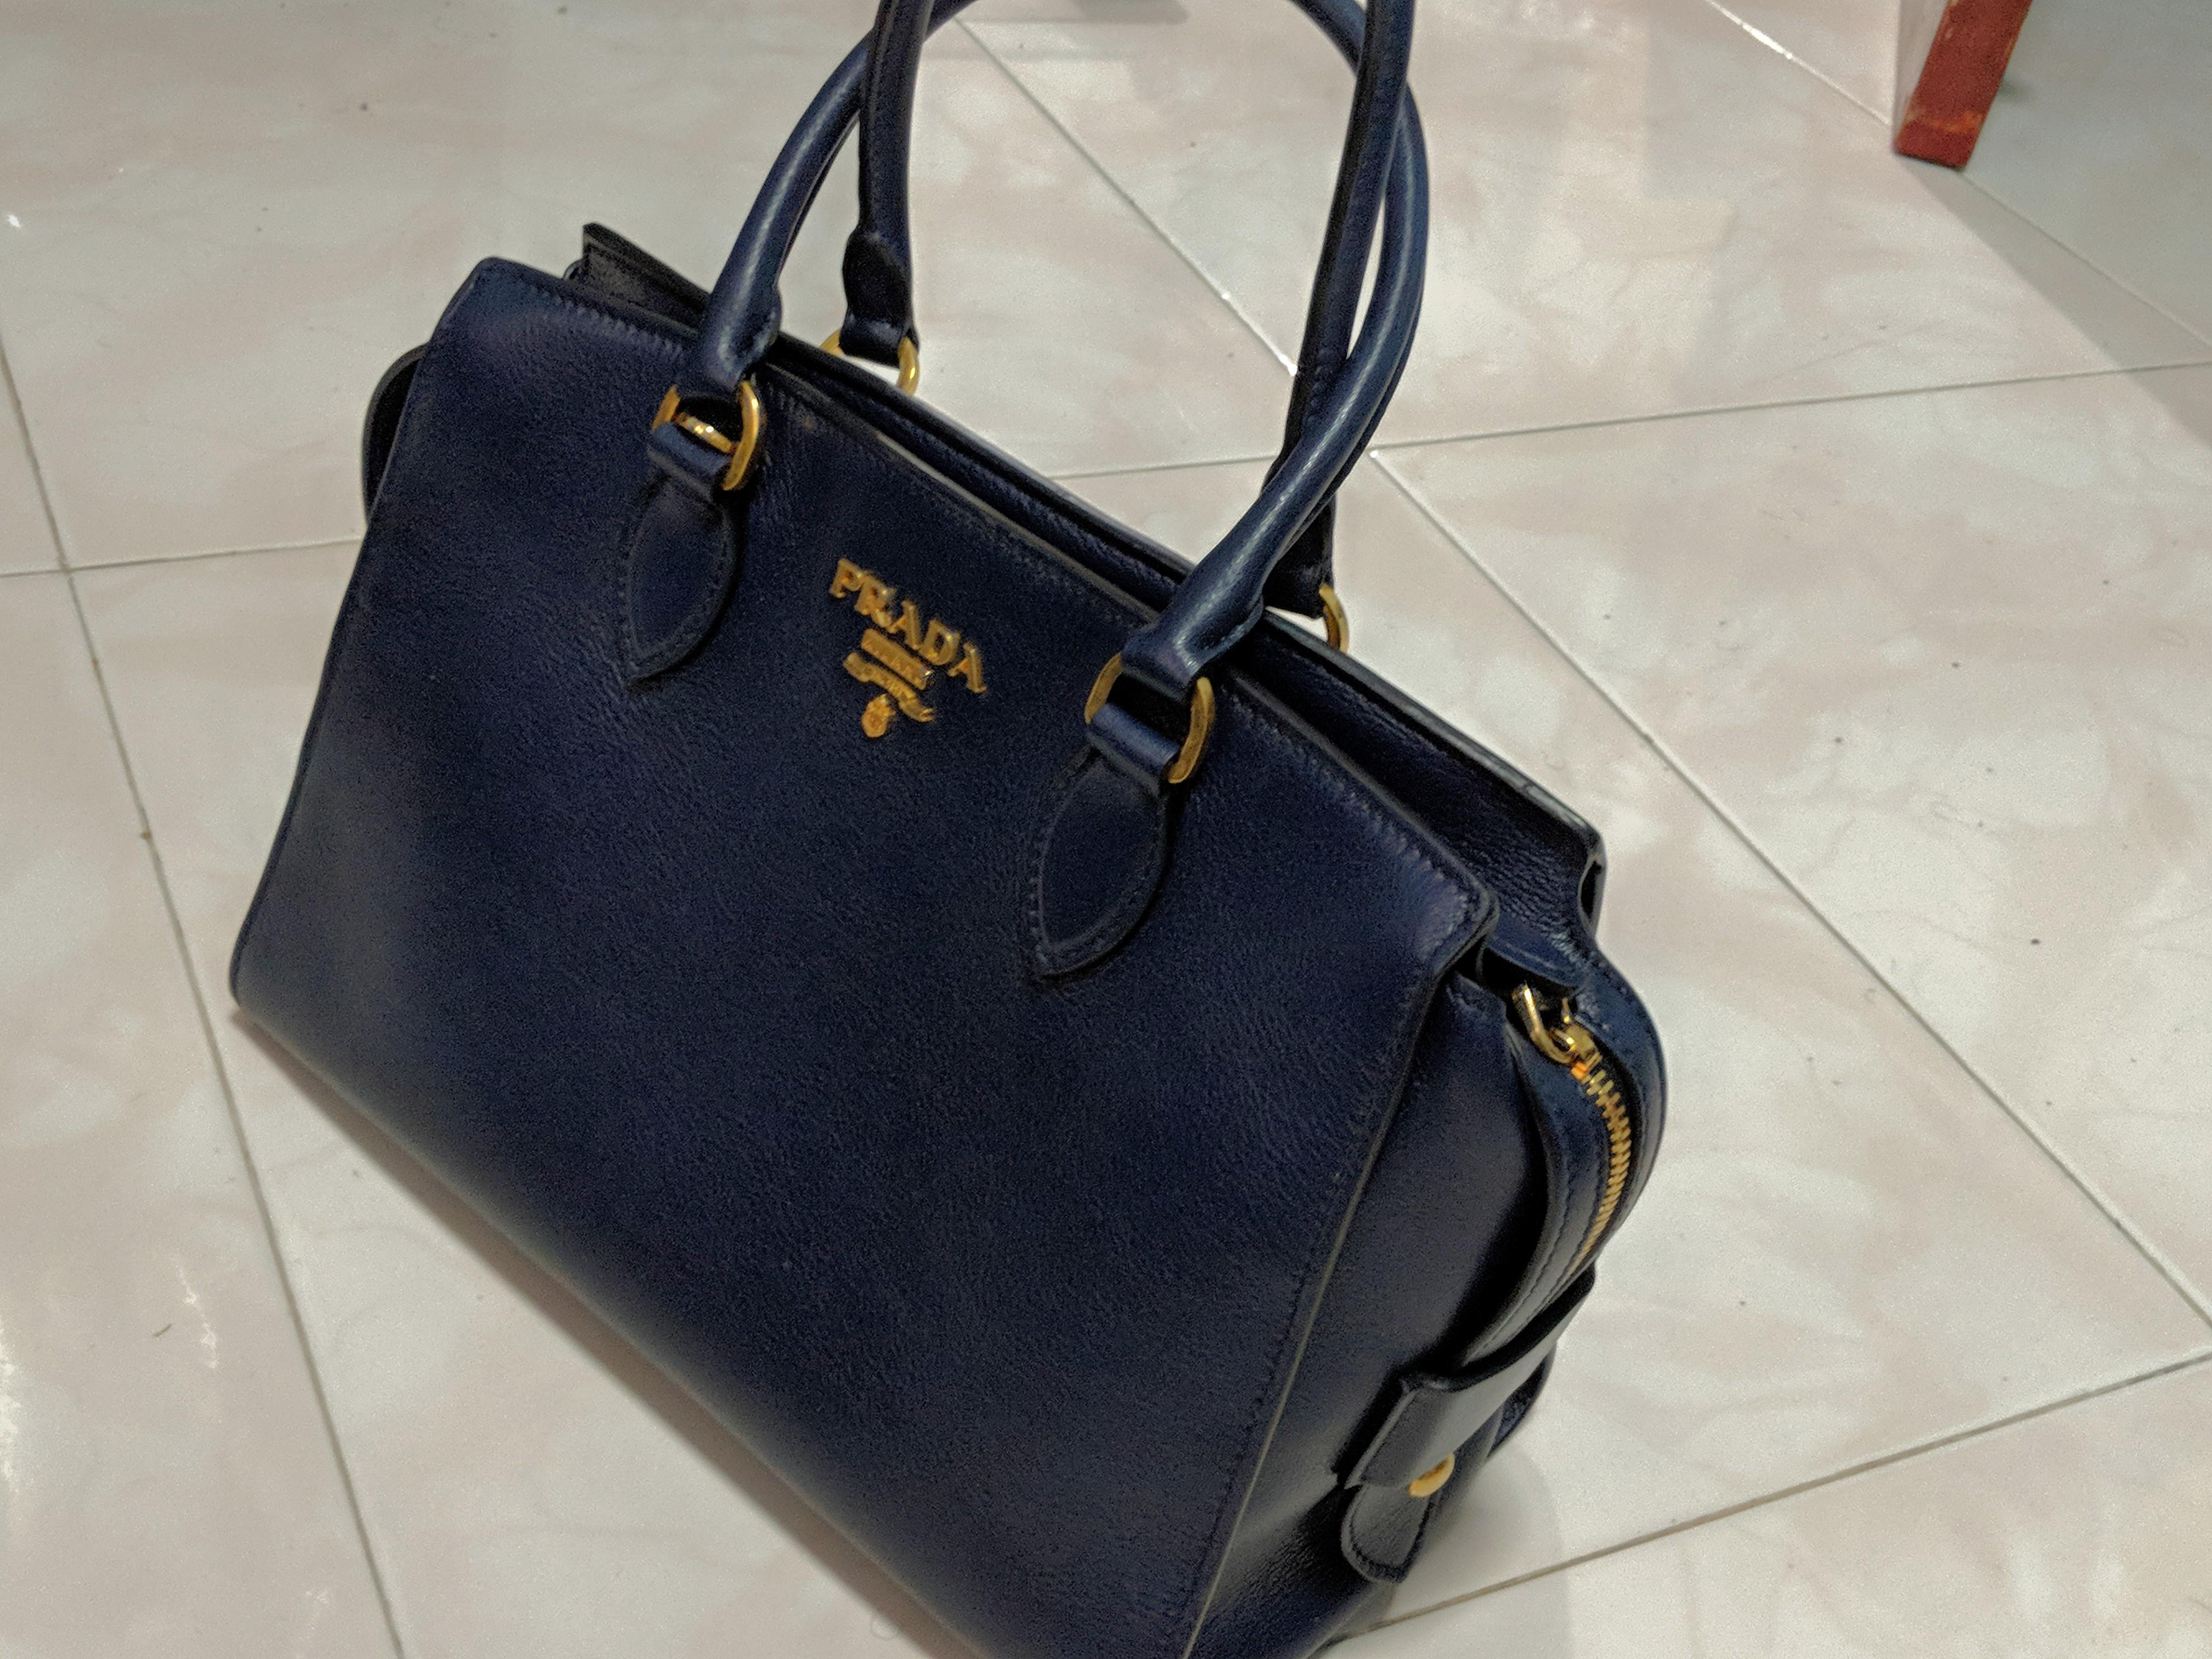 8477d91f3aac Prada Women's Handbag (Baltico/Glace'Calf) From Milan, Women's Fashion, Bags  & Wallets, Handbags on Carousell